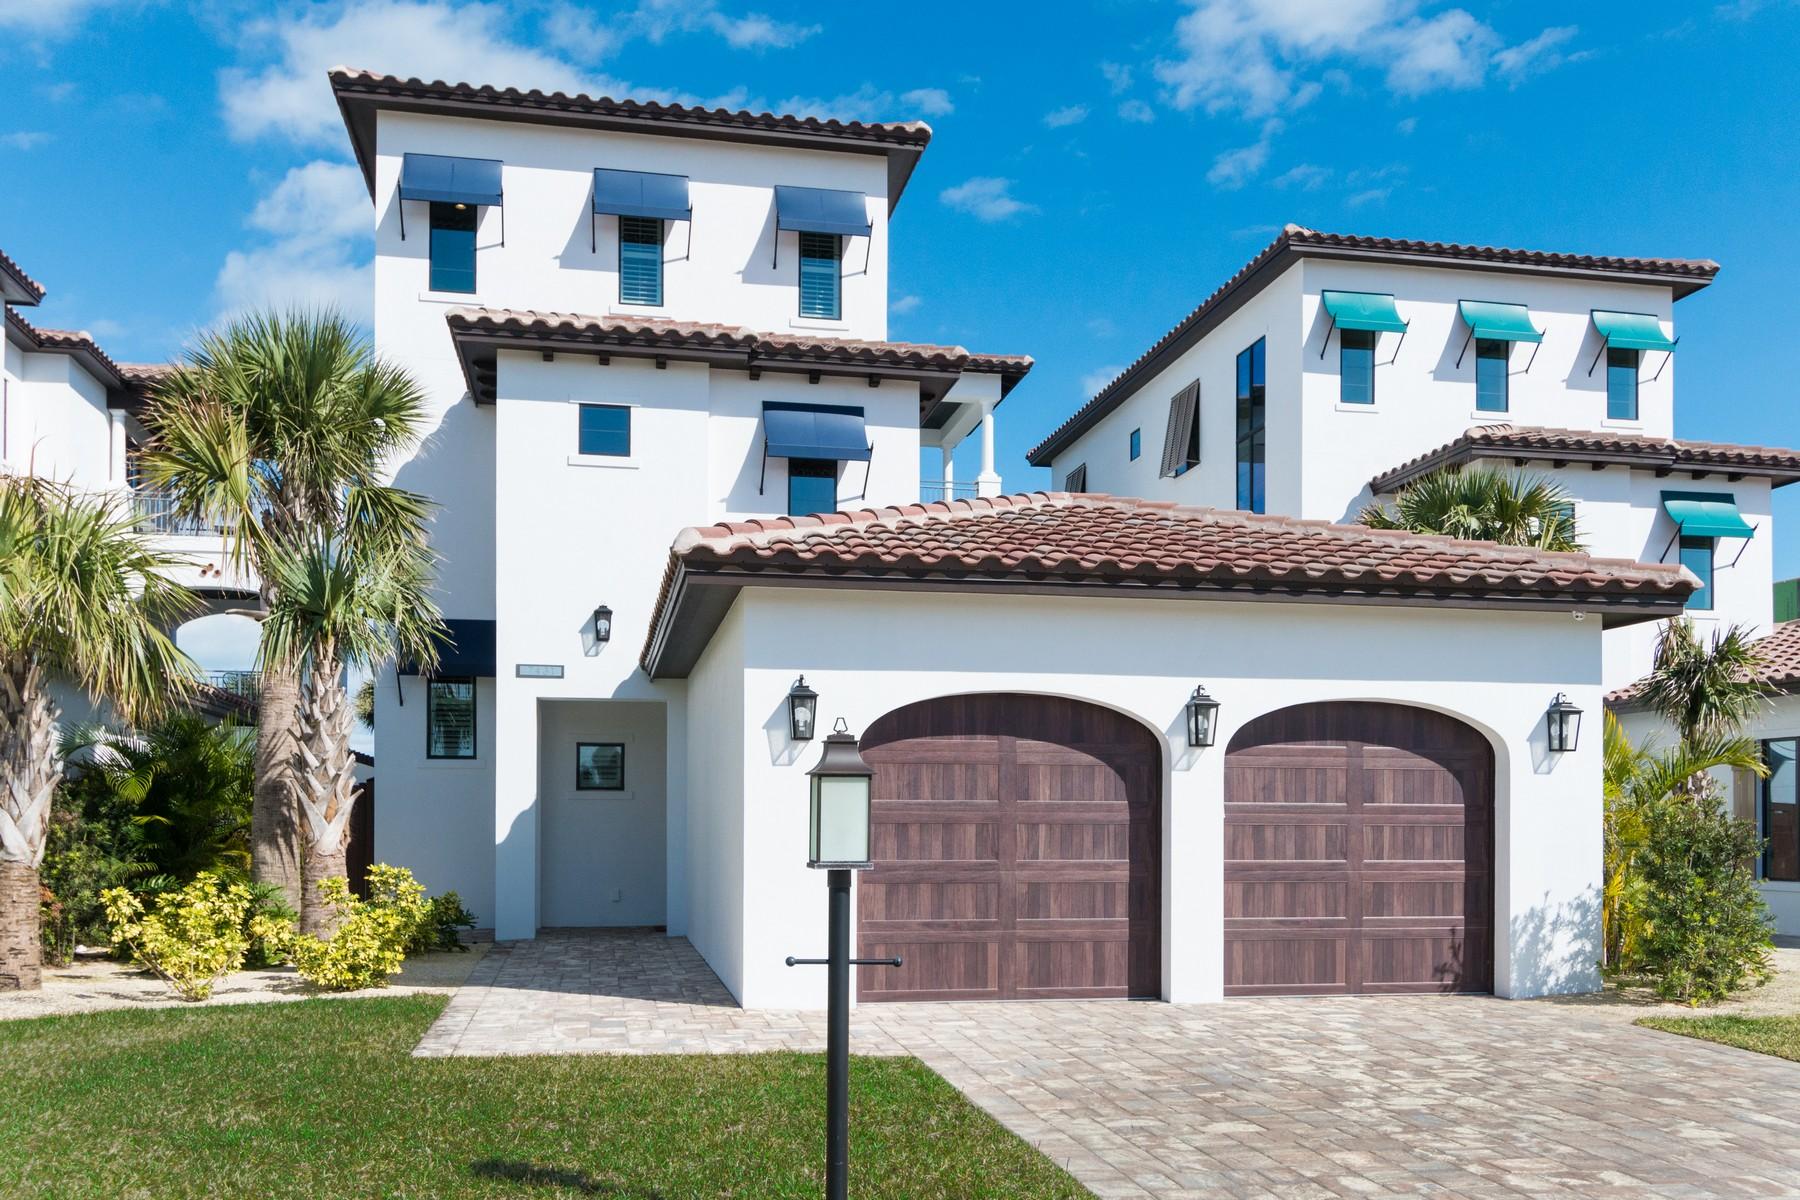 Maison unifamiliale pour l à vendre à Matanilla Reef at Aquarina 7431 Matanilla Reef Way, Melbourne Beach, Florida, 32951 États-Unis